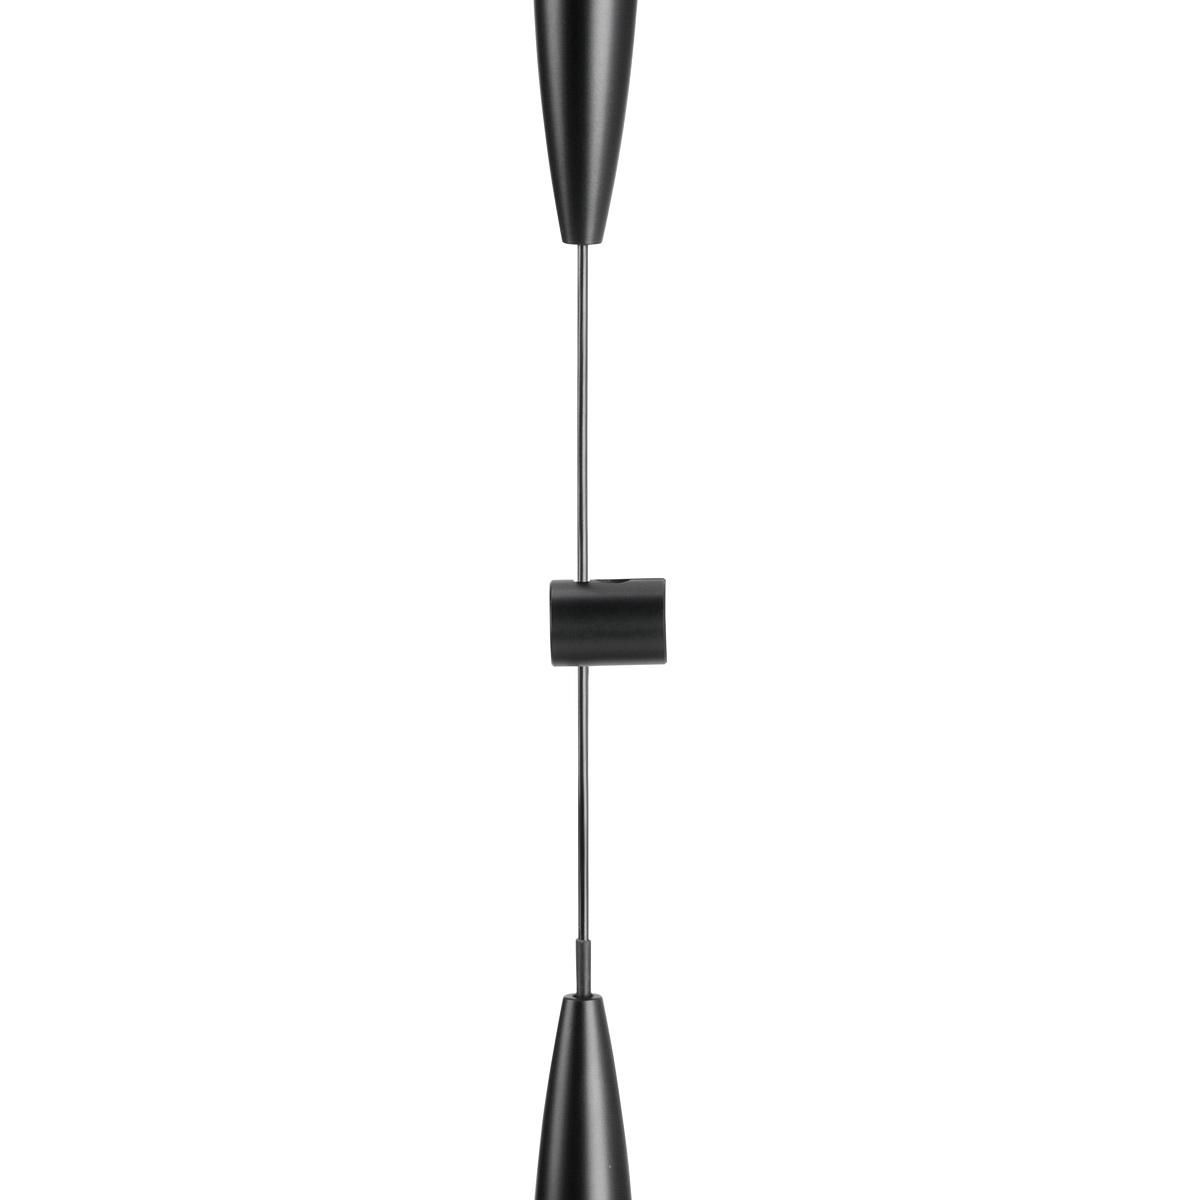 Left Wine Cellar Aluminum Cable Support one end Matte Black